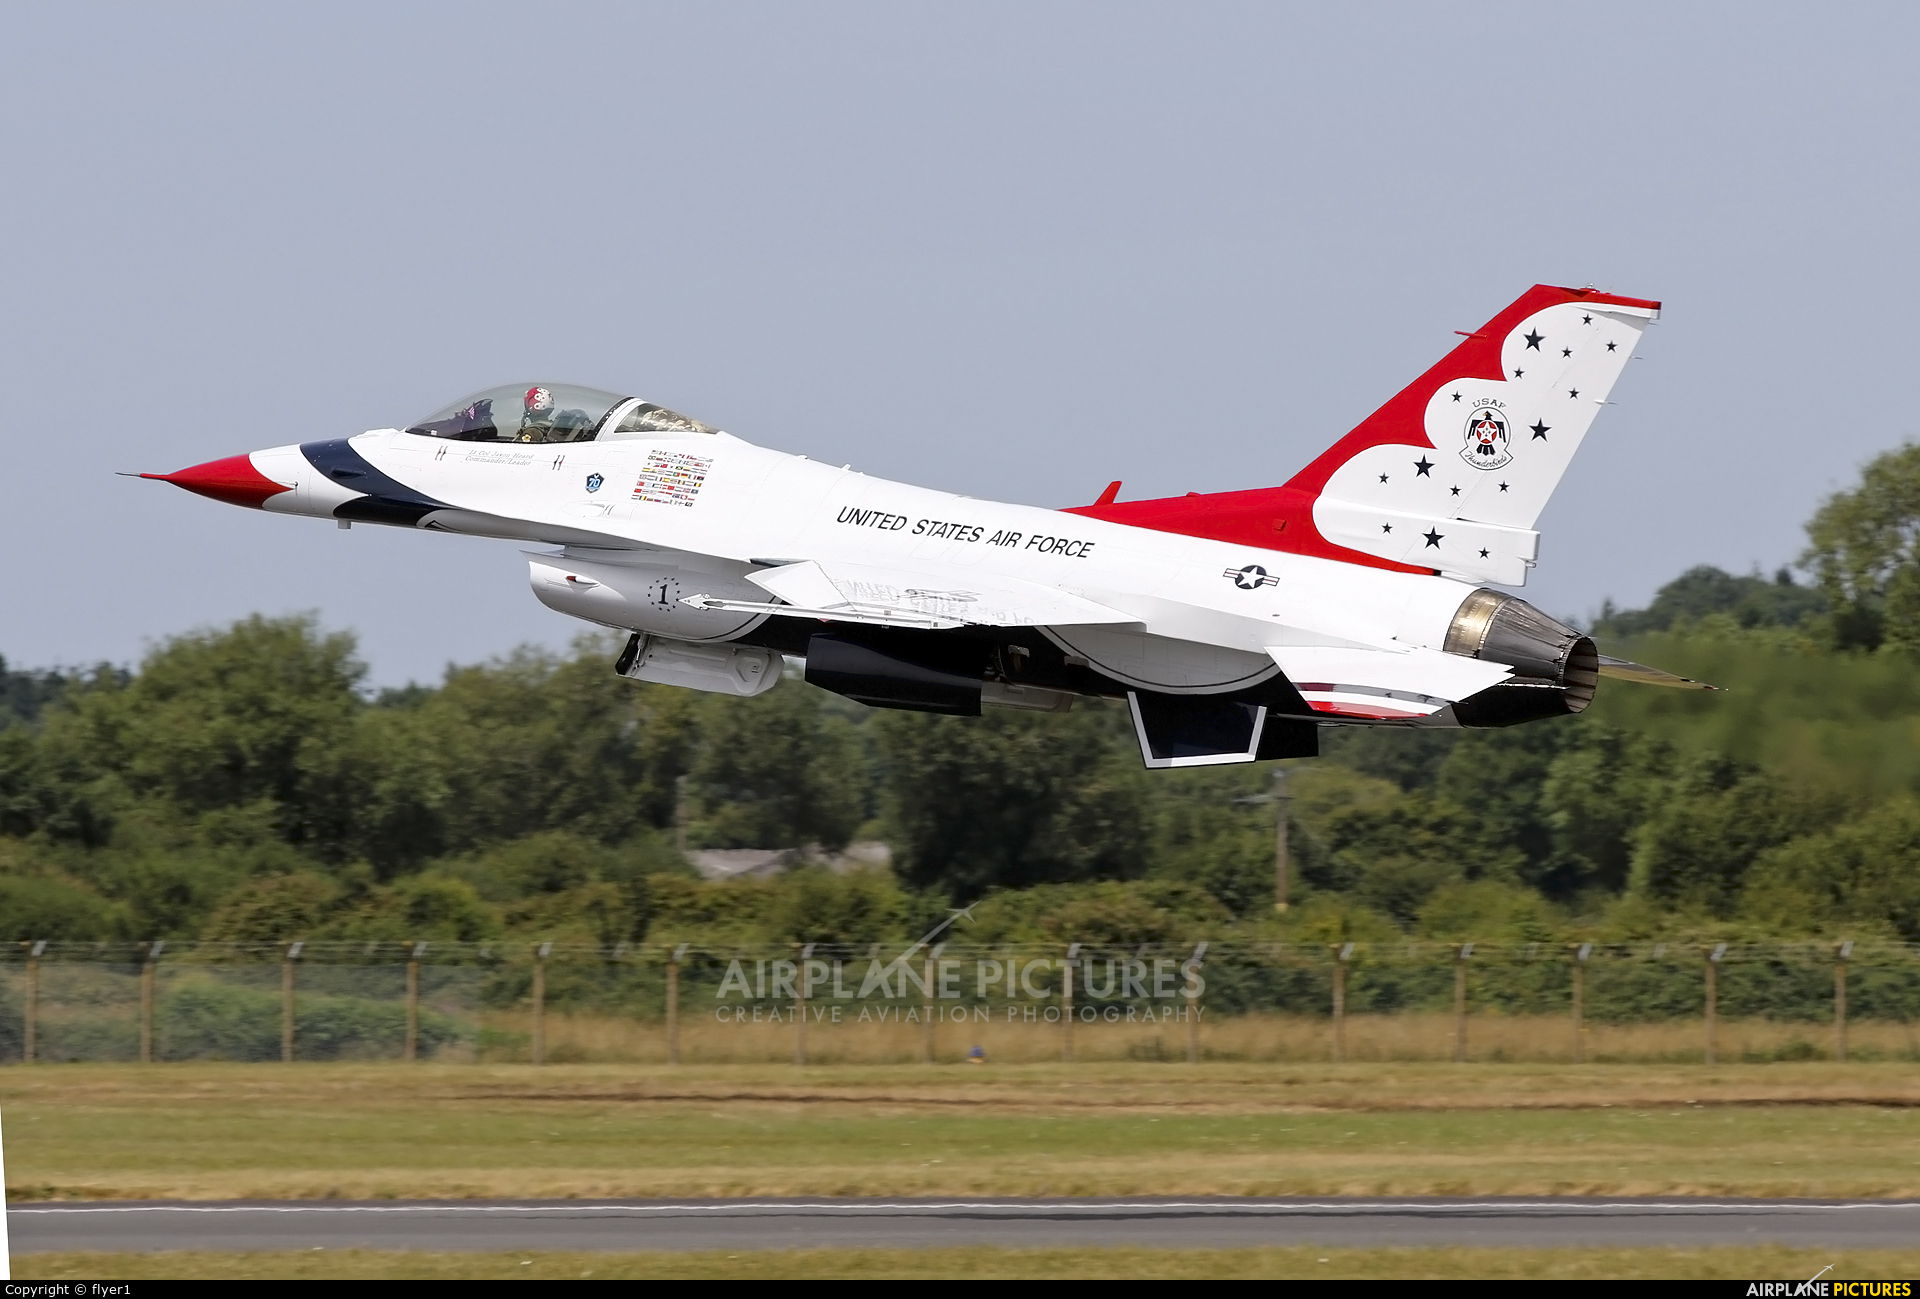 USA - Air Force : Thunderbirds 87-0319 aircraft at Fairford